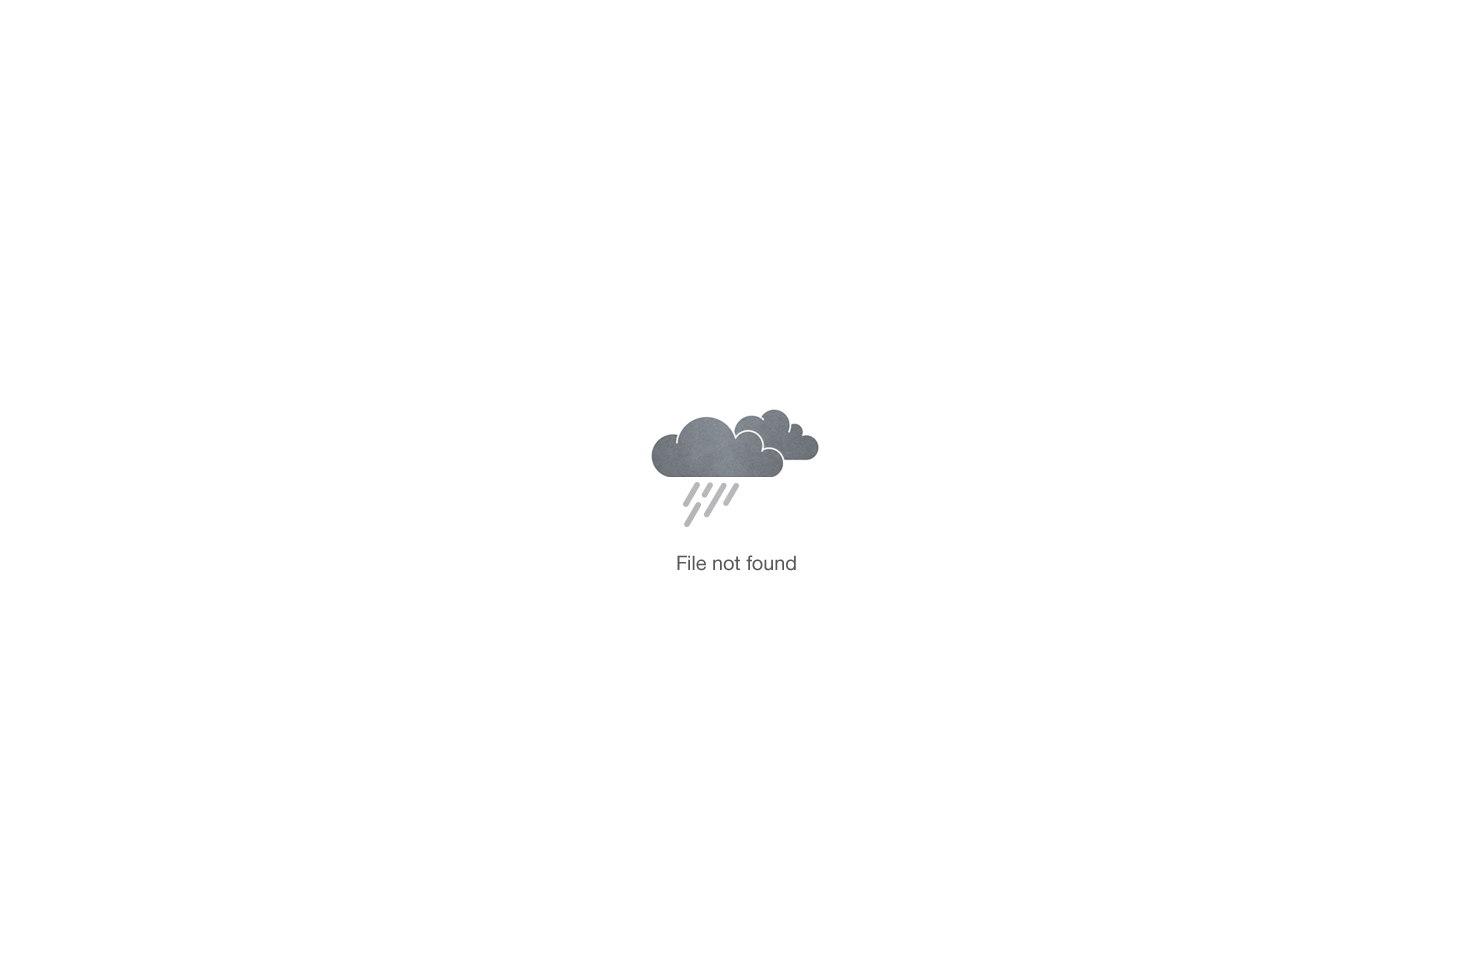 Guilhem-Baschet-Cyclisme-Sponsorise-me-image-1